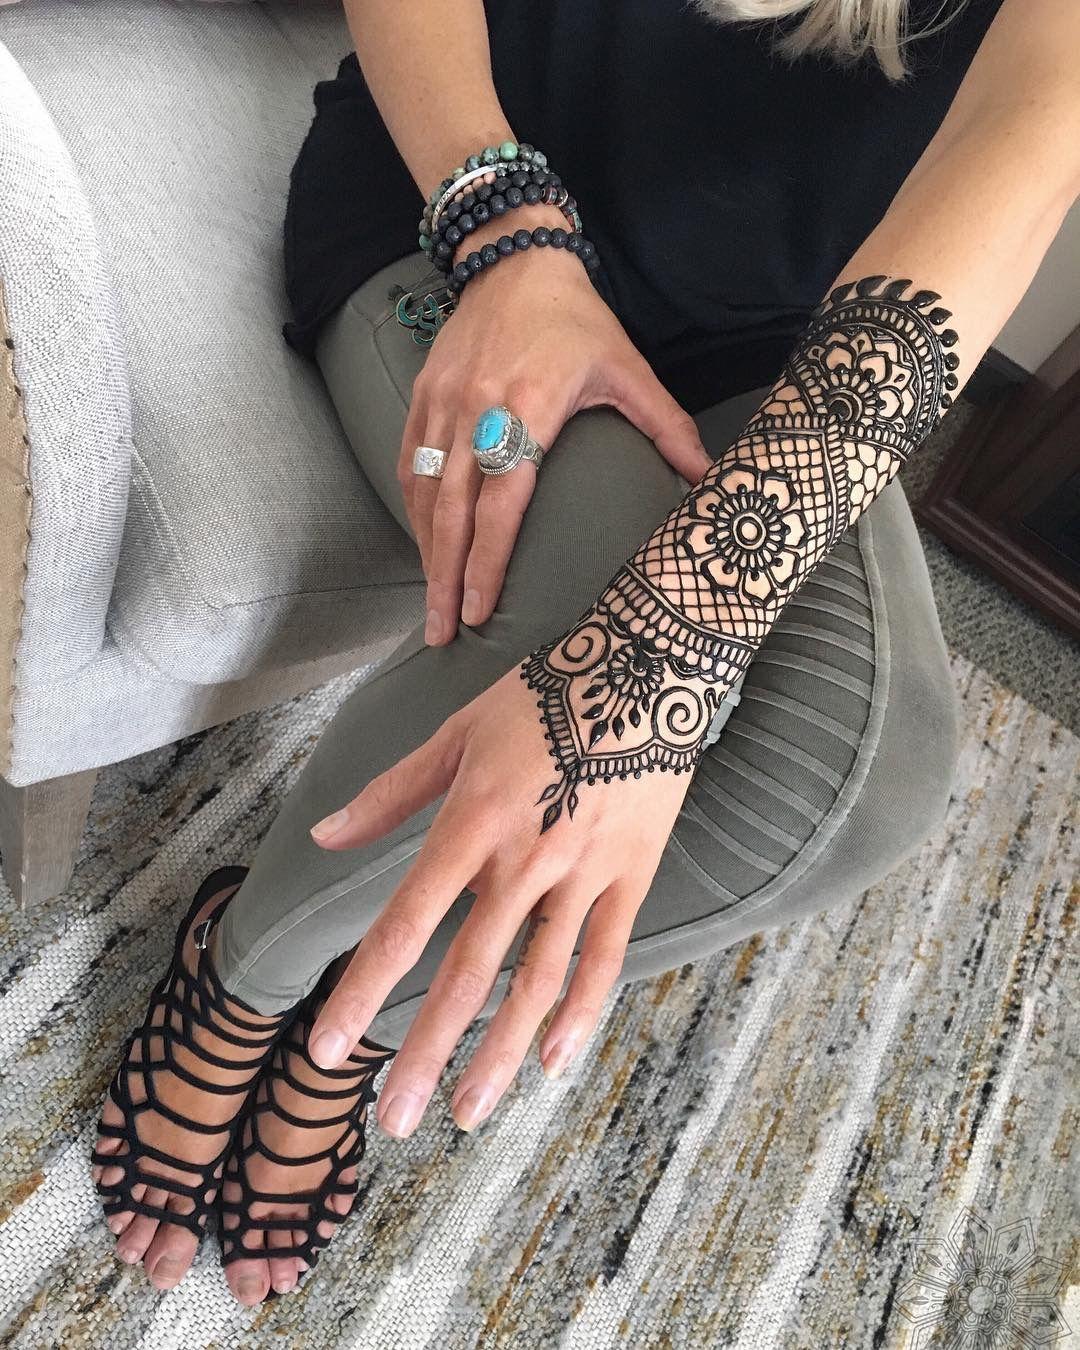 Pin By Shelly Zundell On Halloween Themed Wedding In 2020 Henna Hand Tattoo Henna Modern Henna